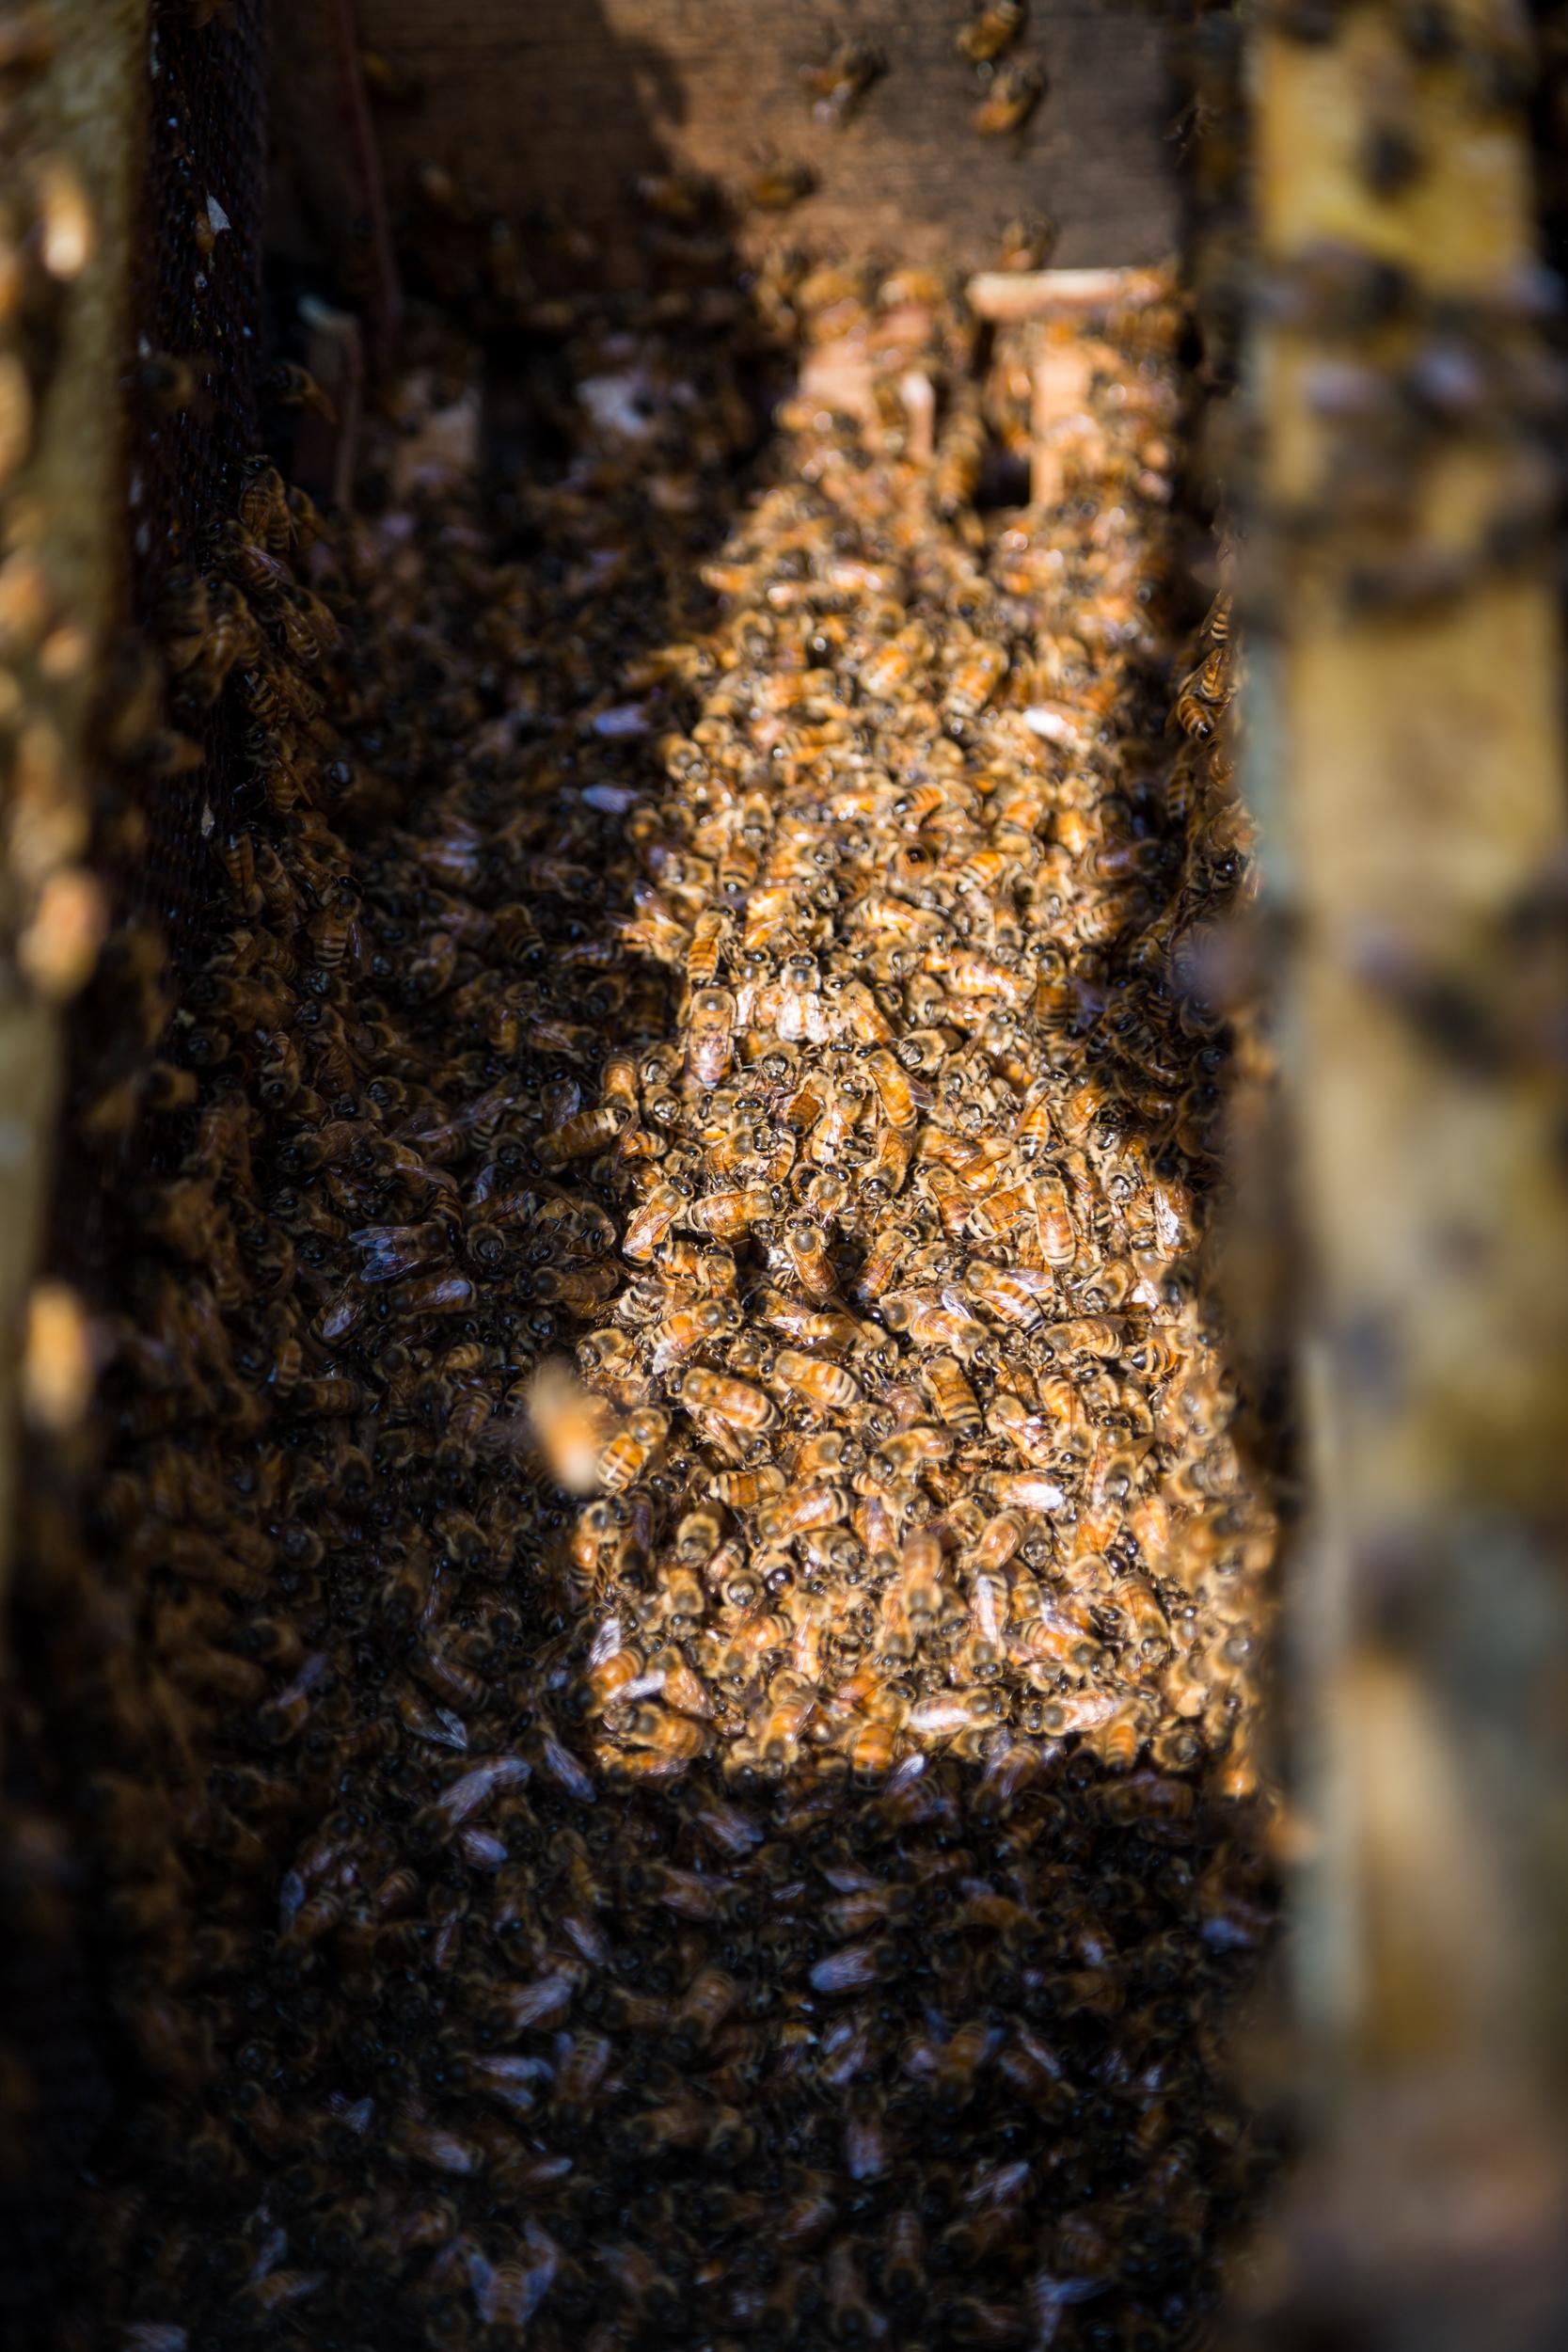 Beekeeper-22.jpg